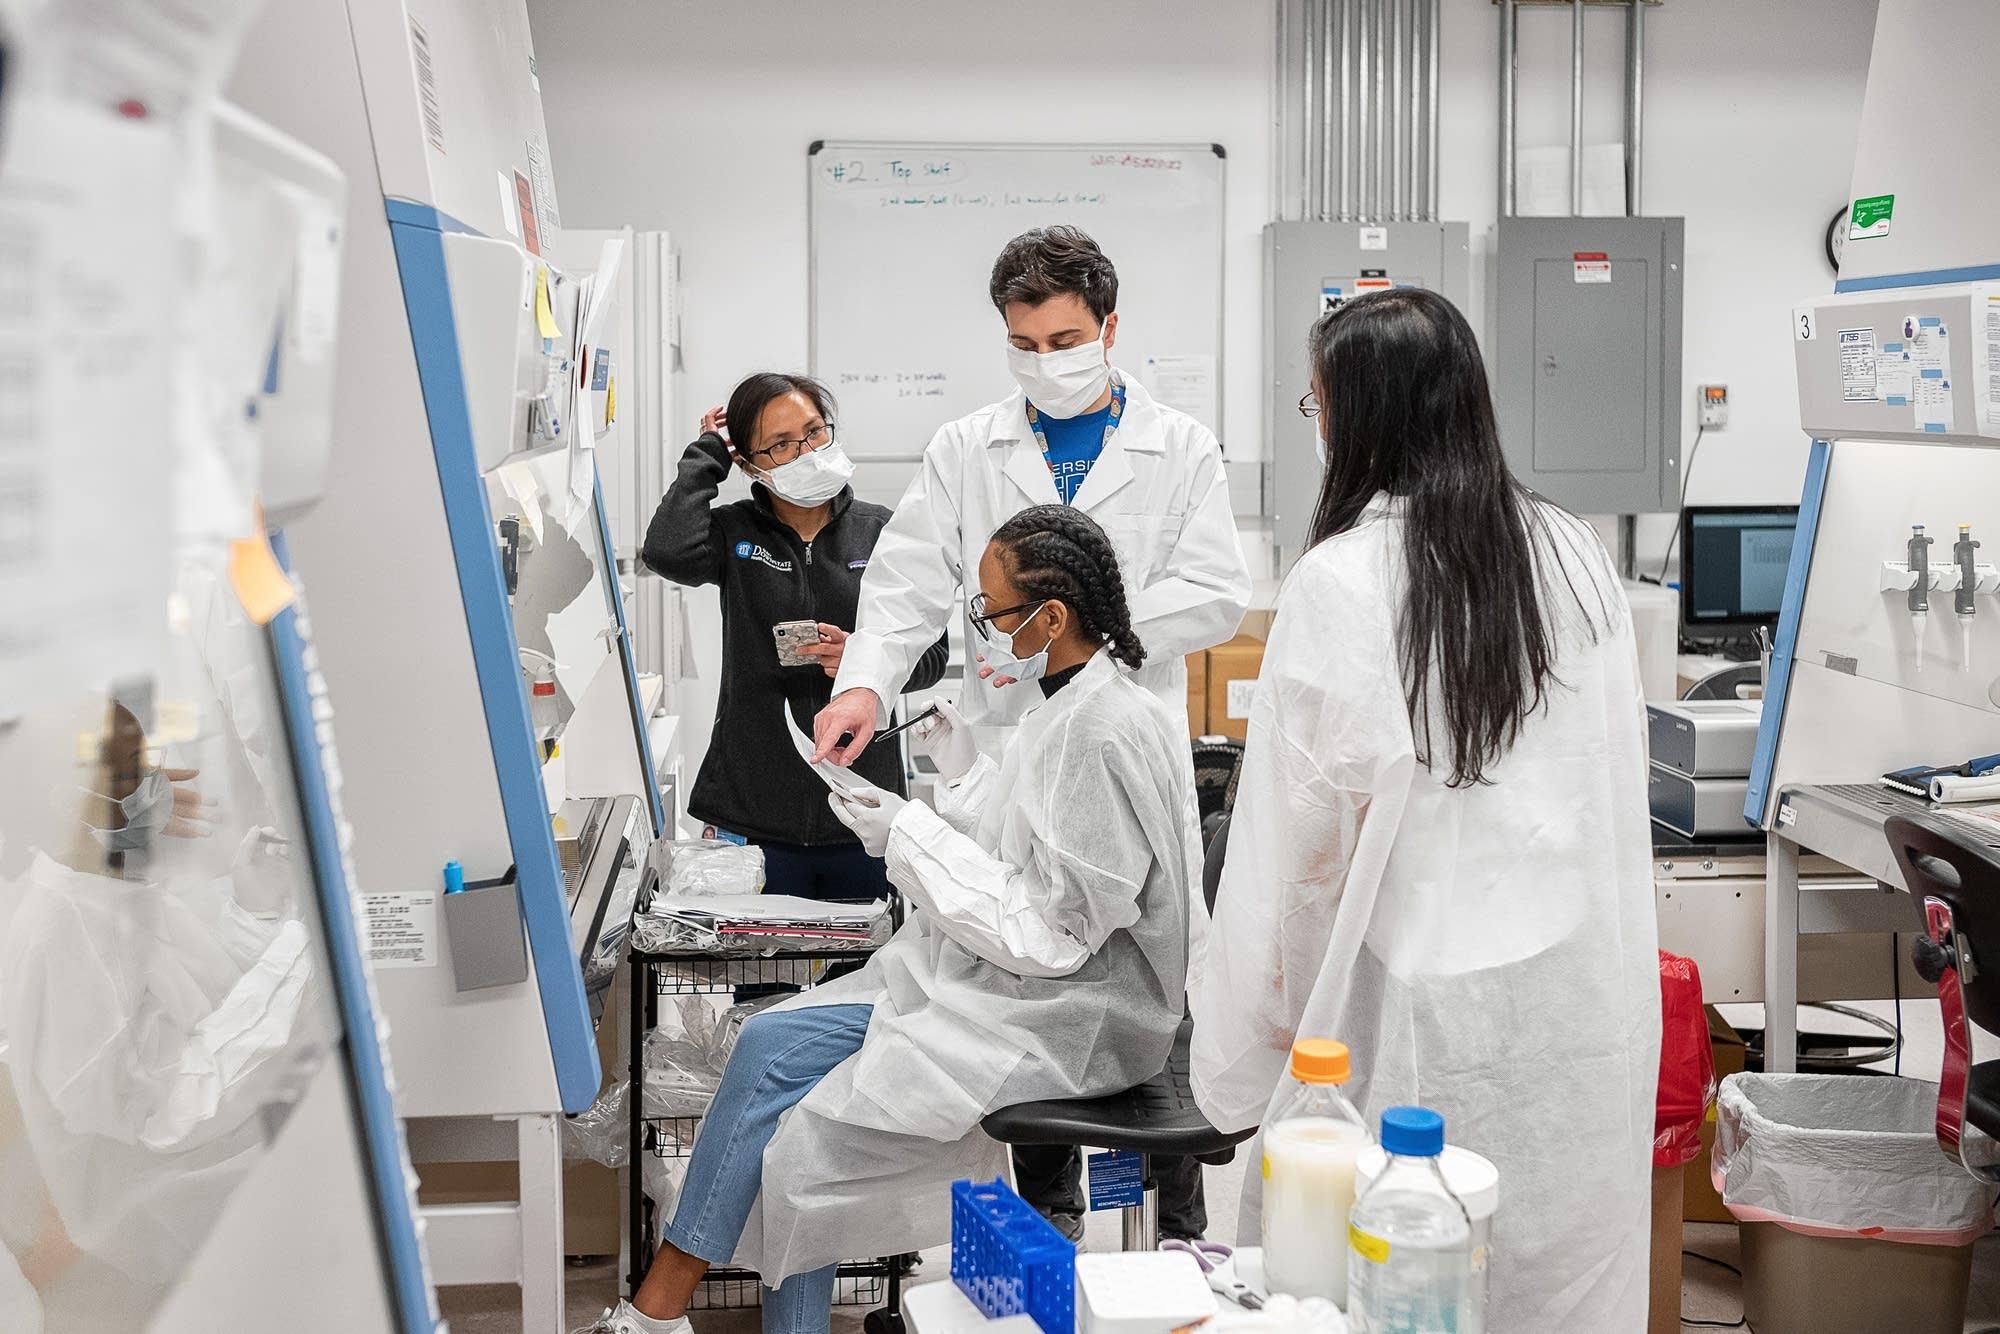 Lab scientists work to validate rapid antibody tests of Covid-19 samples